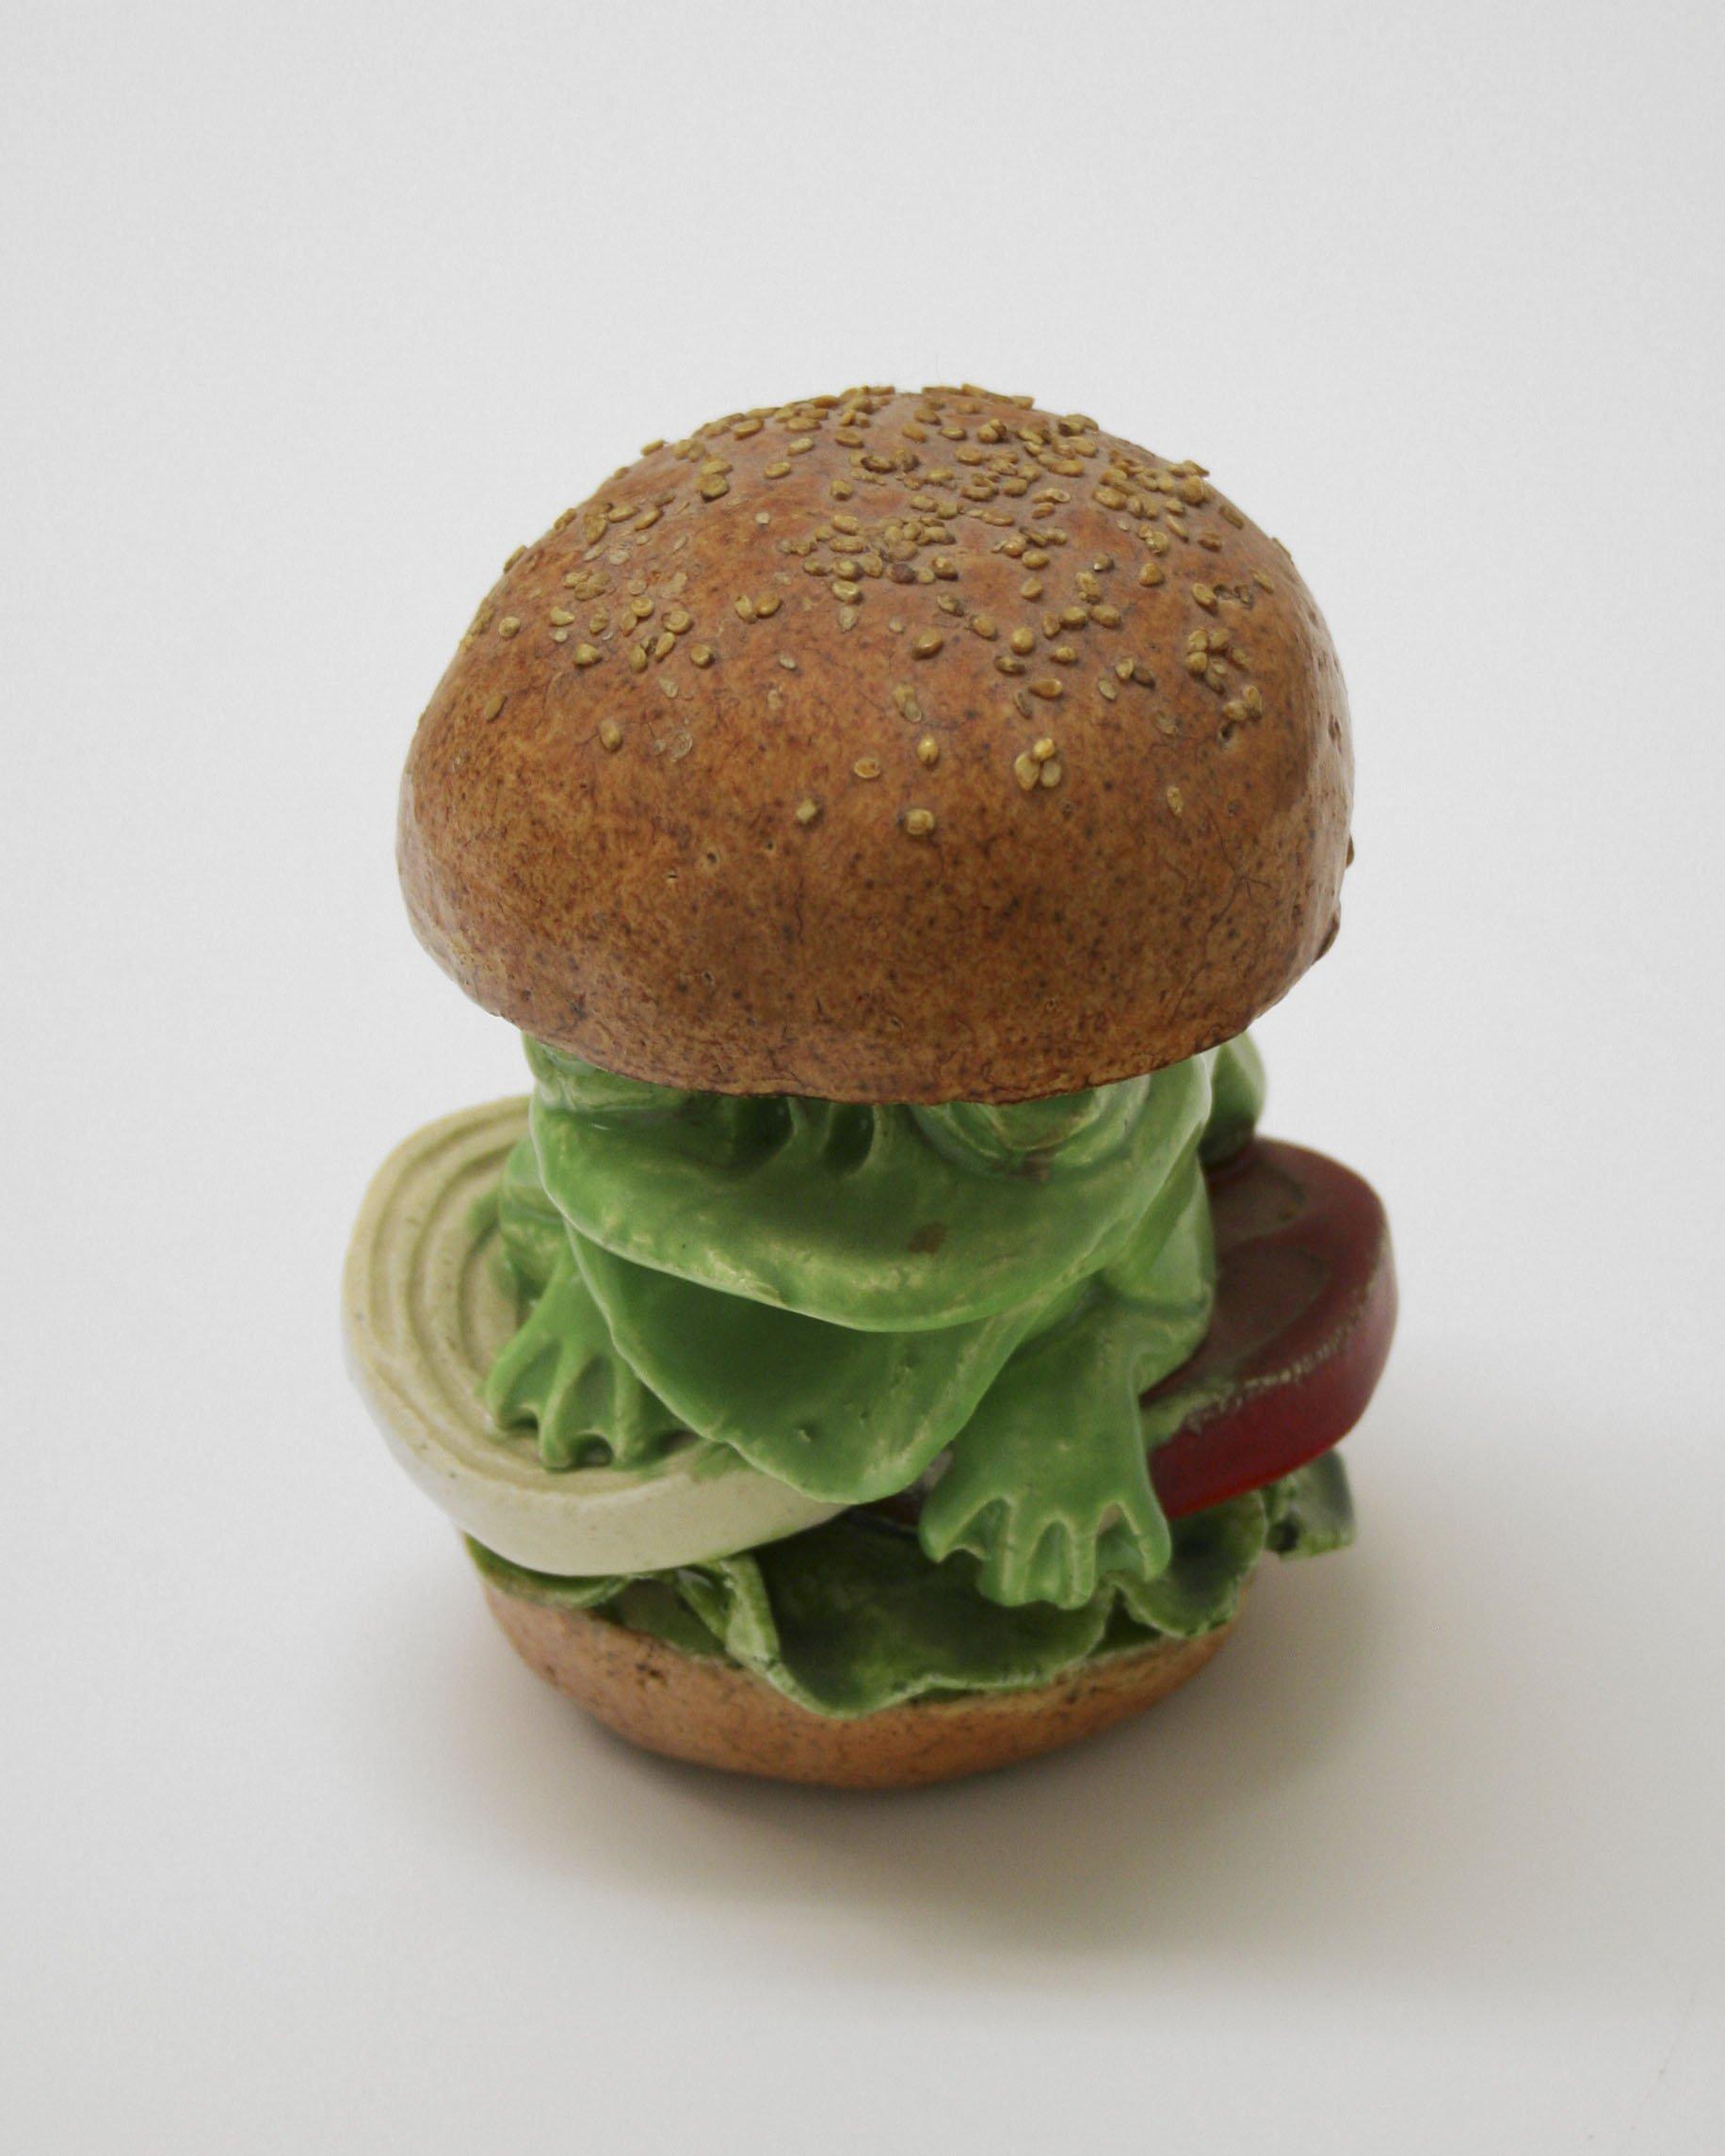 Gilhooly, David – Frog Burger